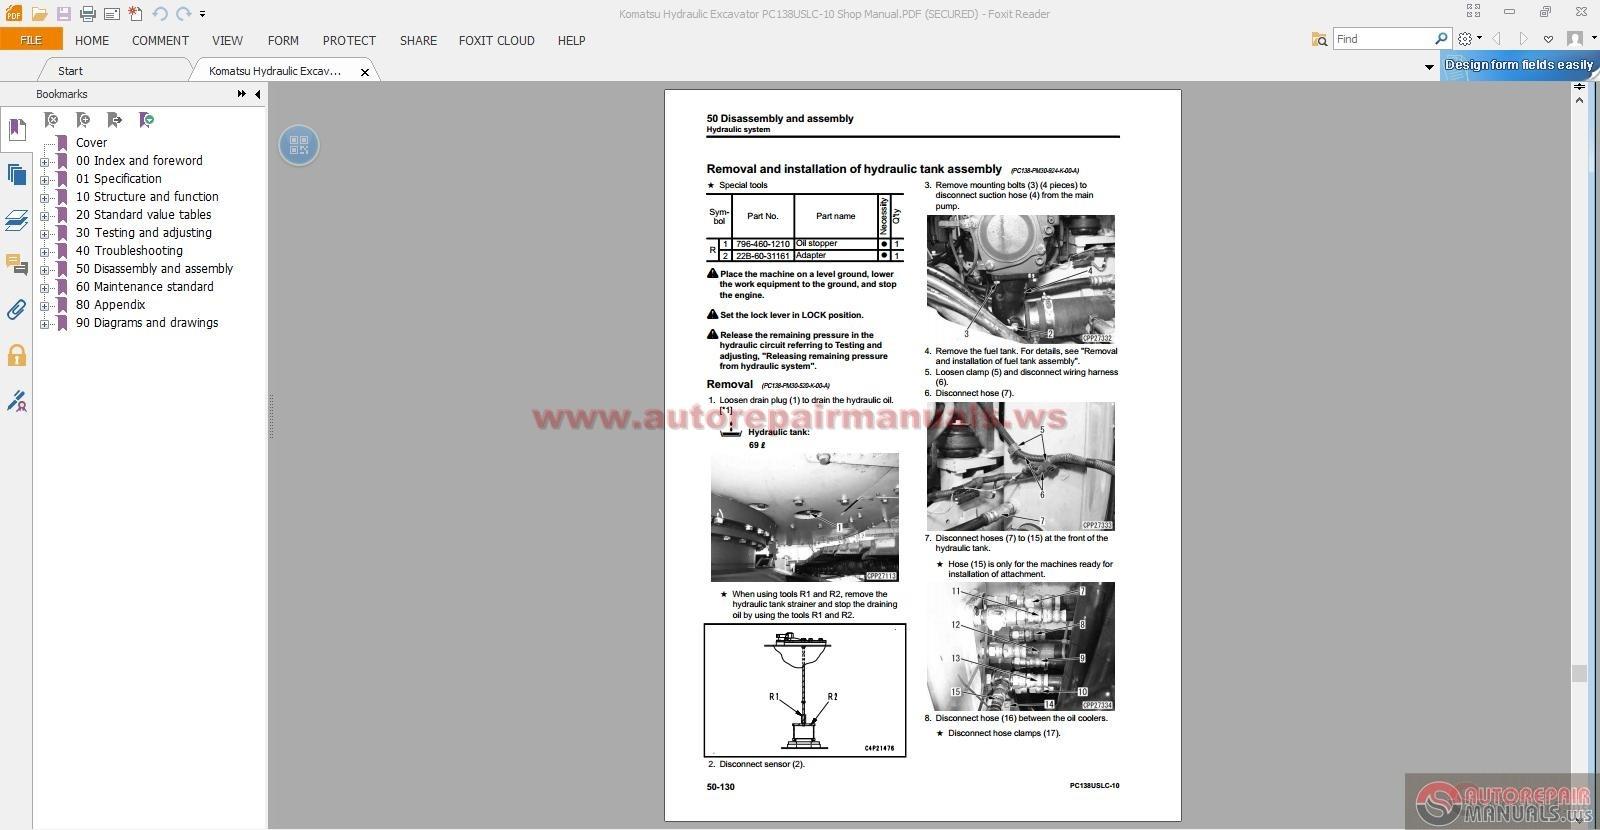 komatsu hydraulic excavator service manuals 2013 2014. Black Bedroom Furniture Sets. Home Design Ideas